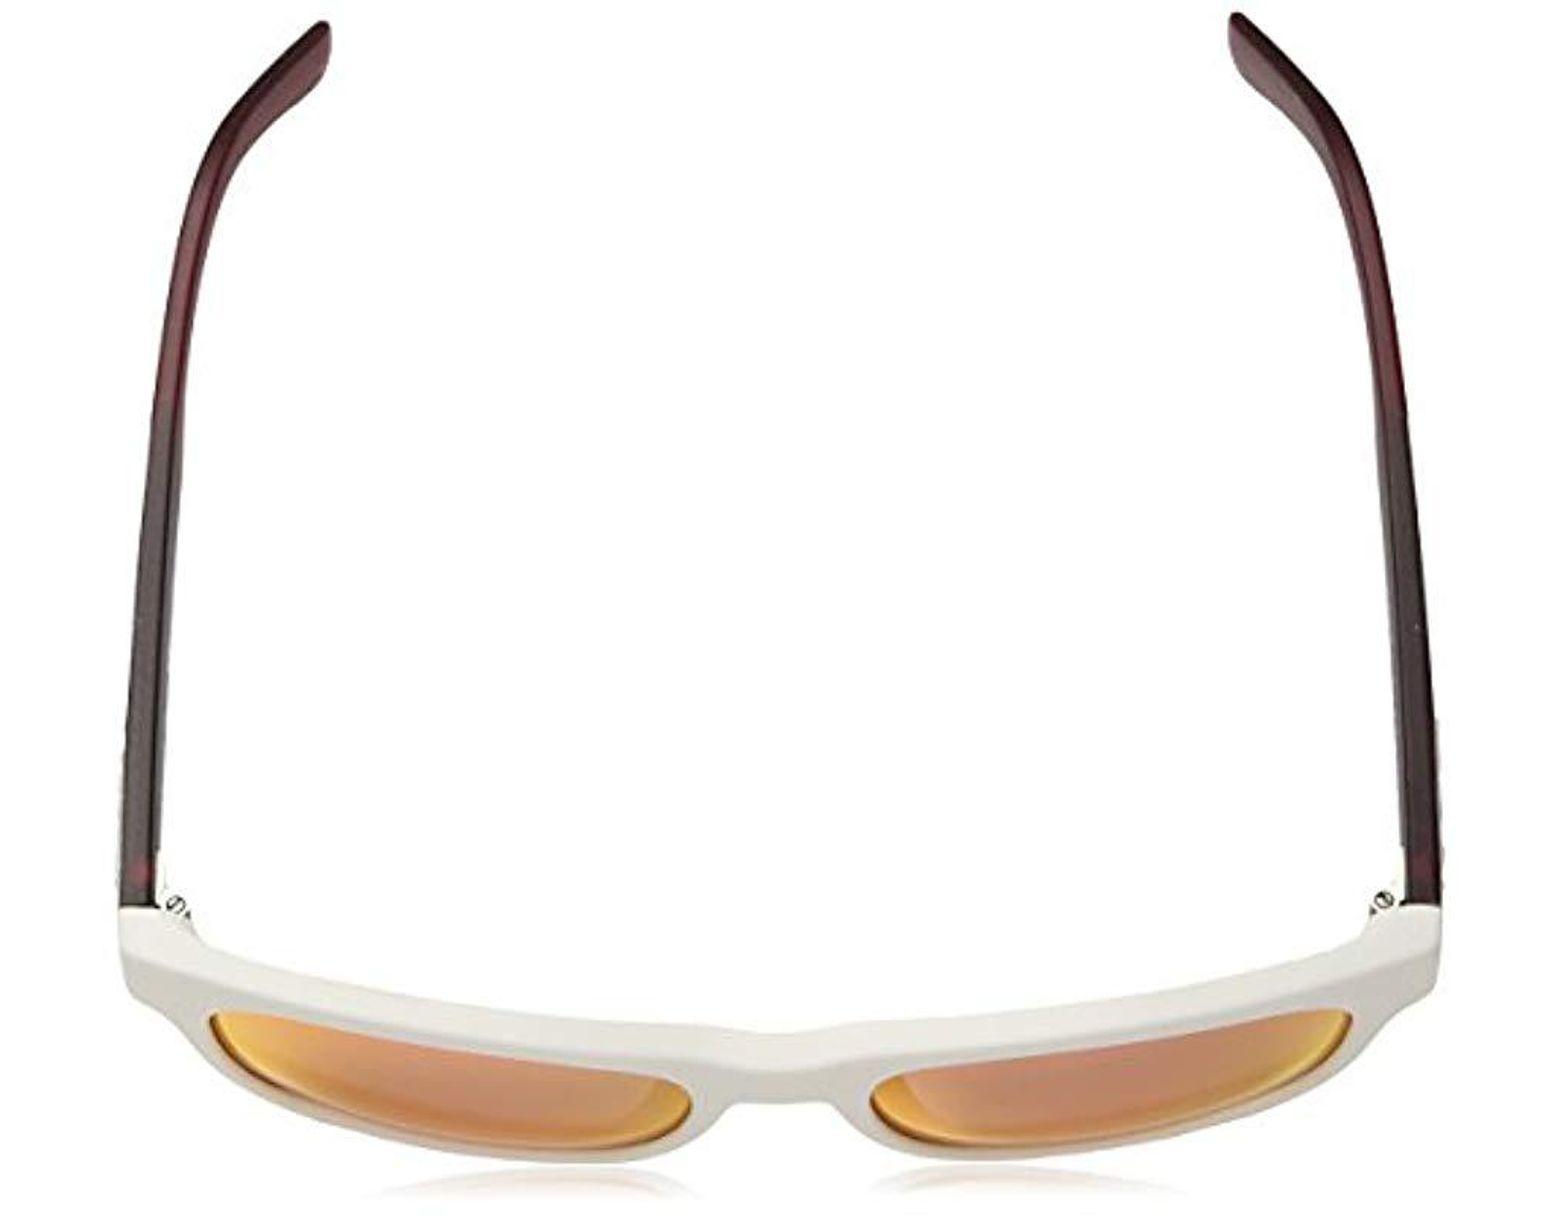 1b96adaf18ac0 Women's L829snd Plastic Rectangular Novak Djokovic Capsule Collection  Sunglasses, White, 54 Mm